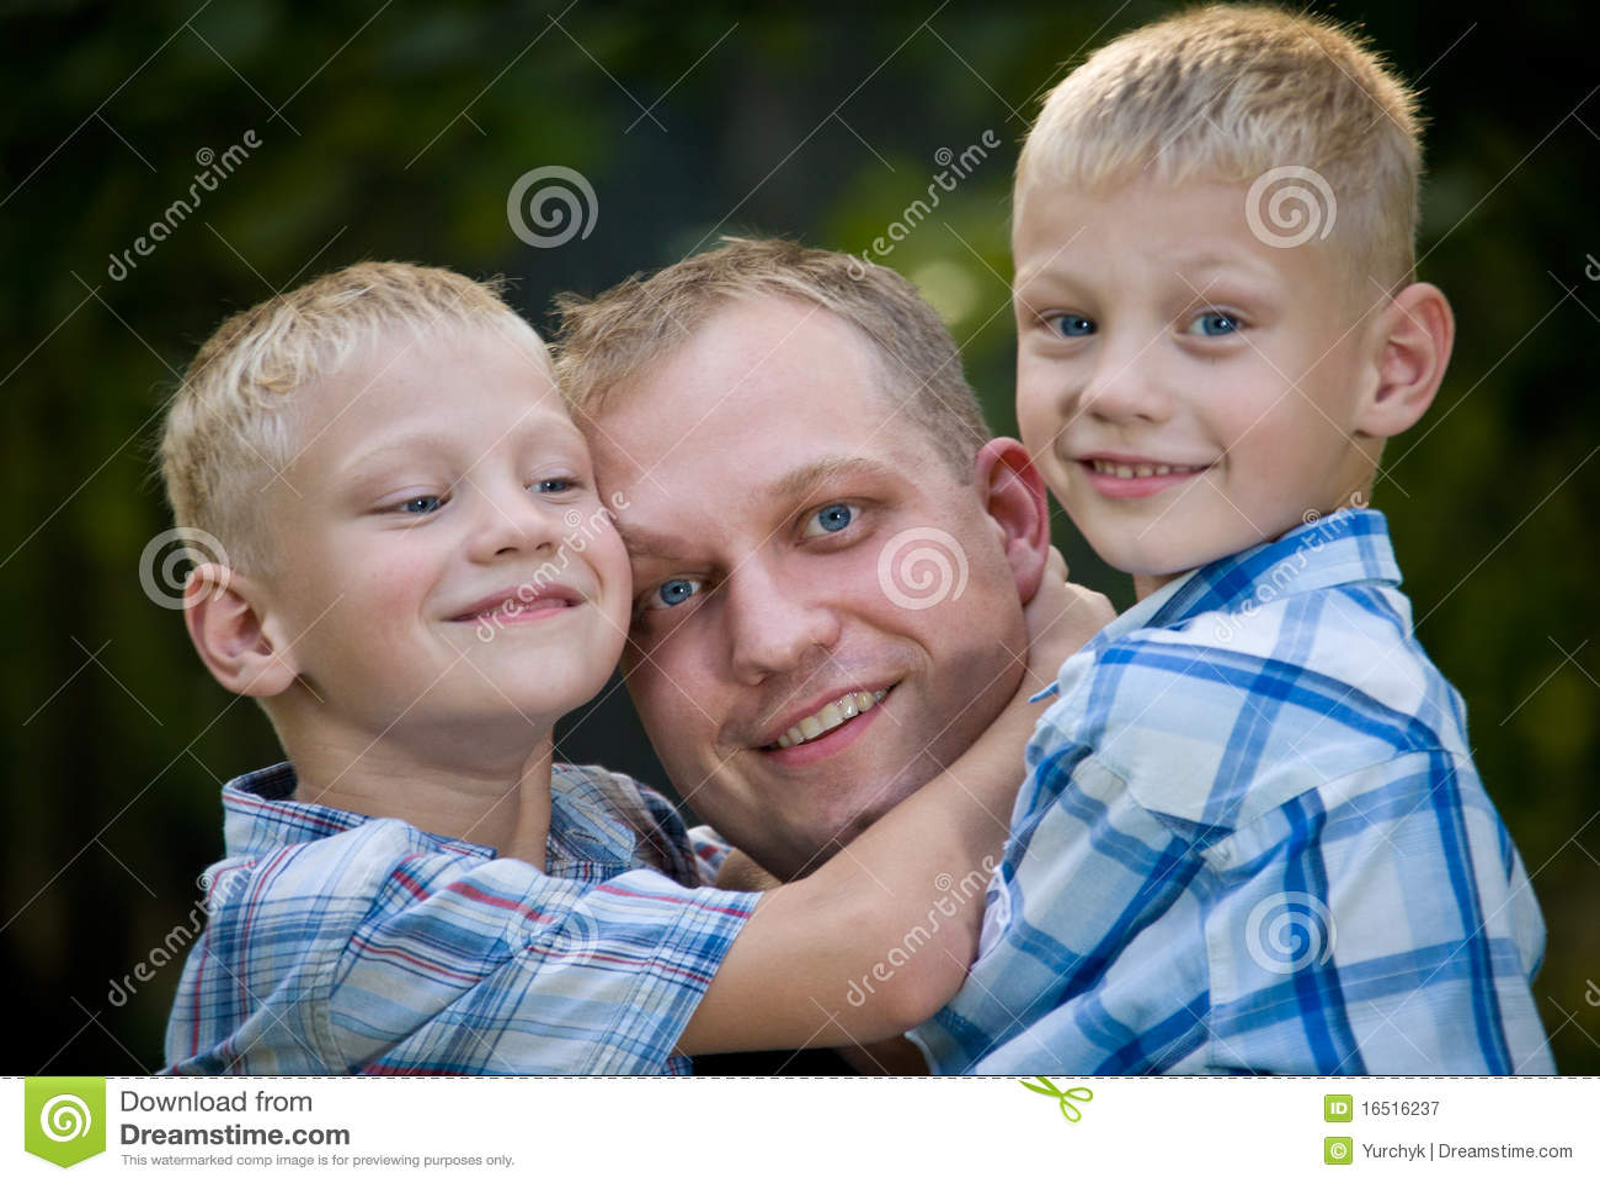 Free amateur vids gay twinks dad